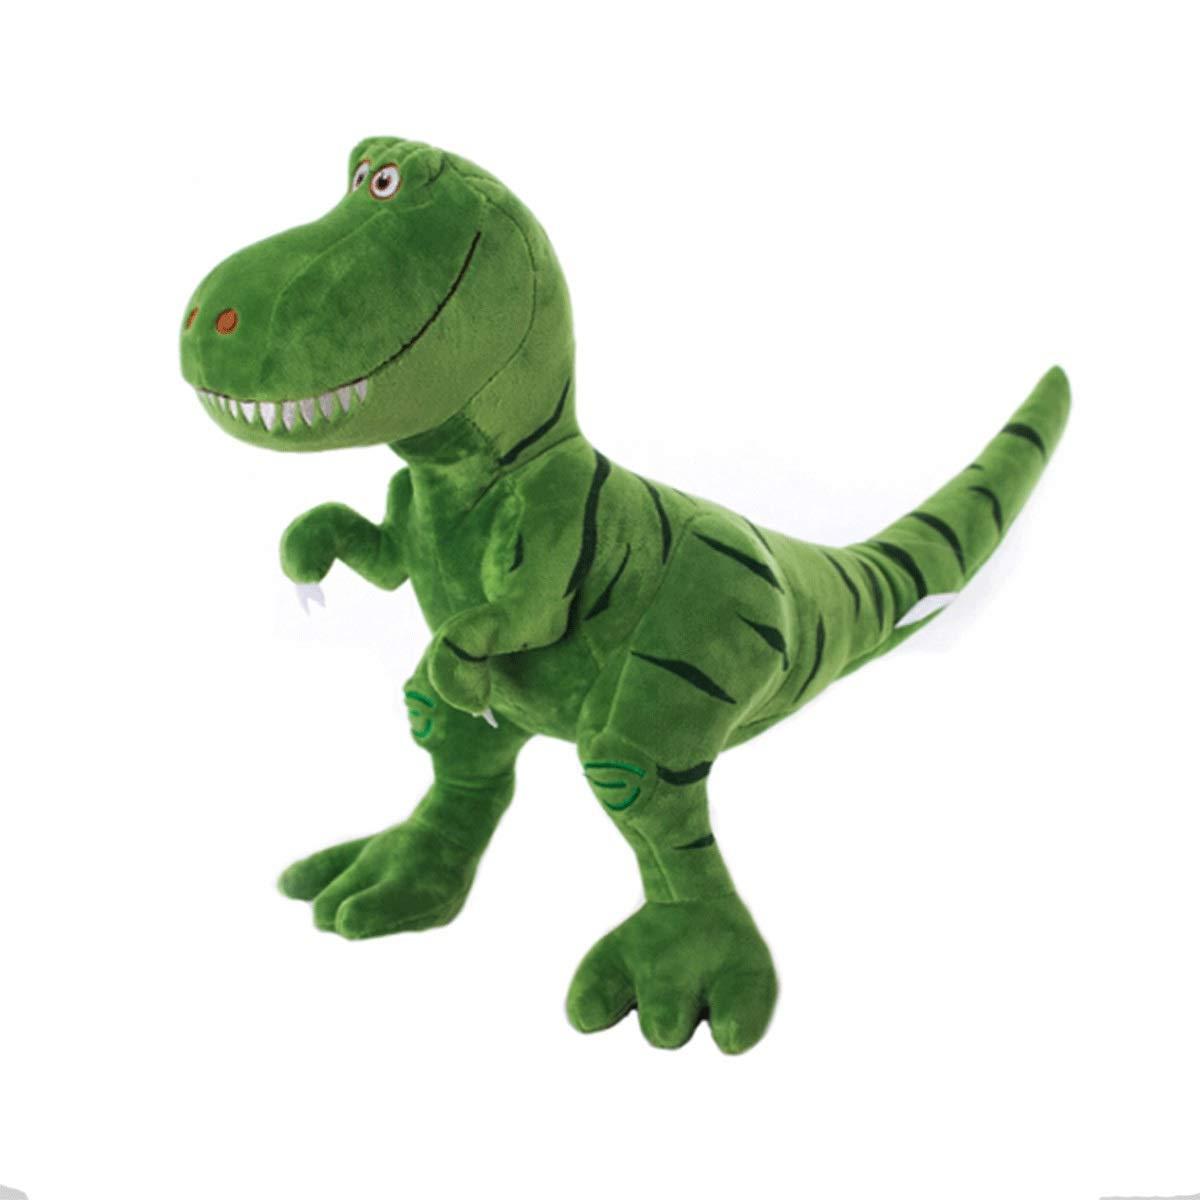 66cm Plush Toys, Tyrannosaurus Dolls, Dinosaur Plush Toys, Doll Doll Pillows, Birthday Gifts, Military Green, 66 cm Long, Best Gift (Size   66cm)